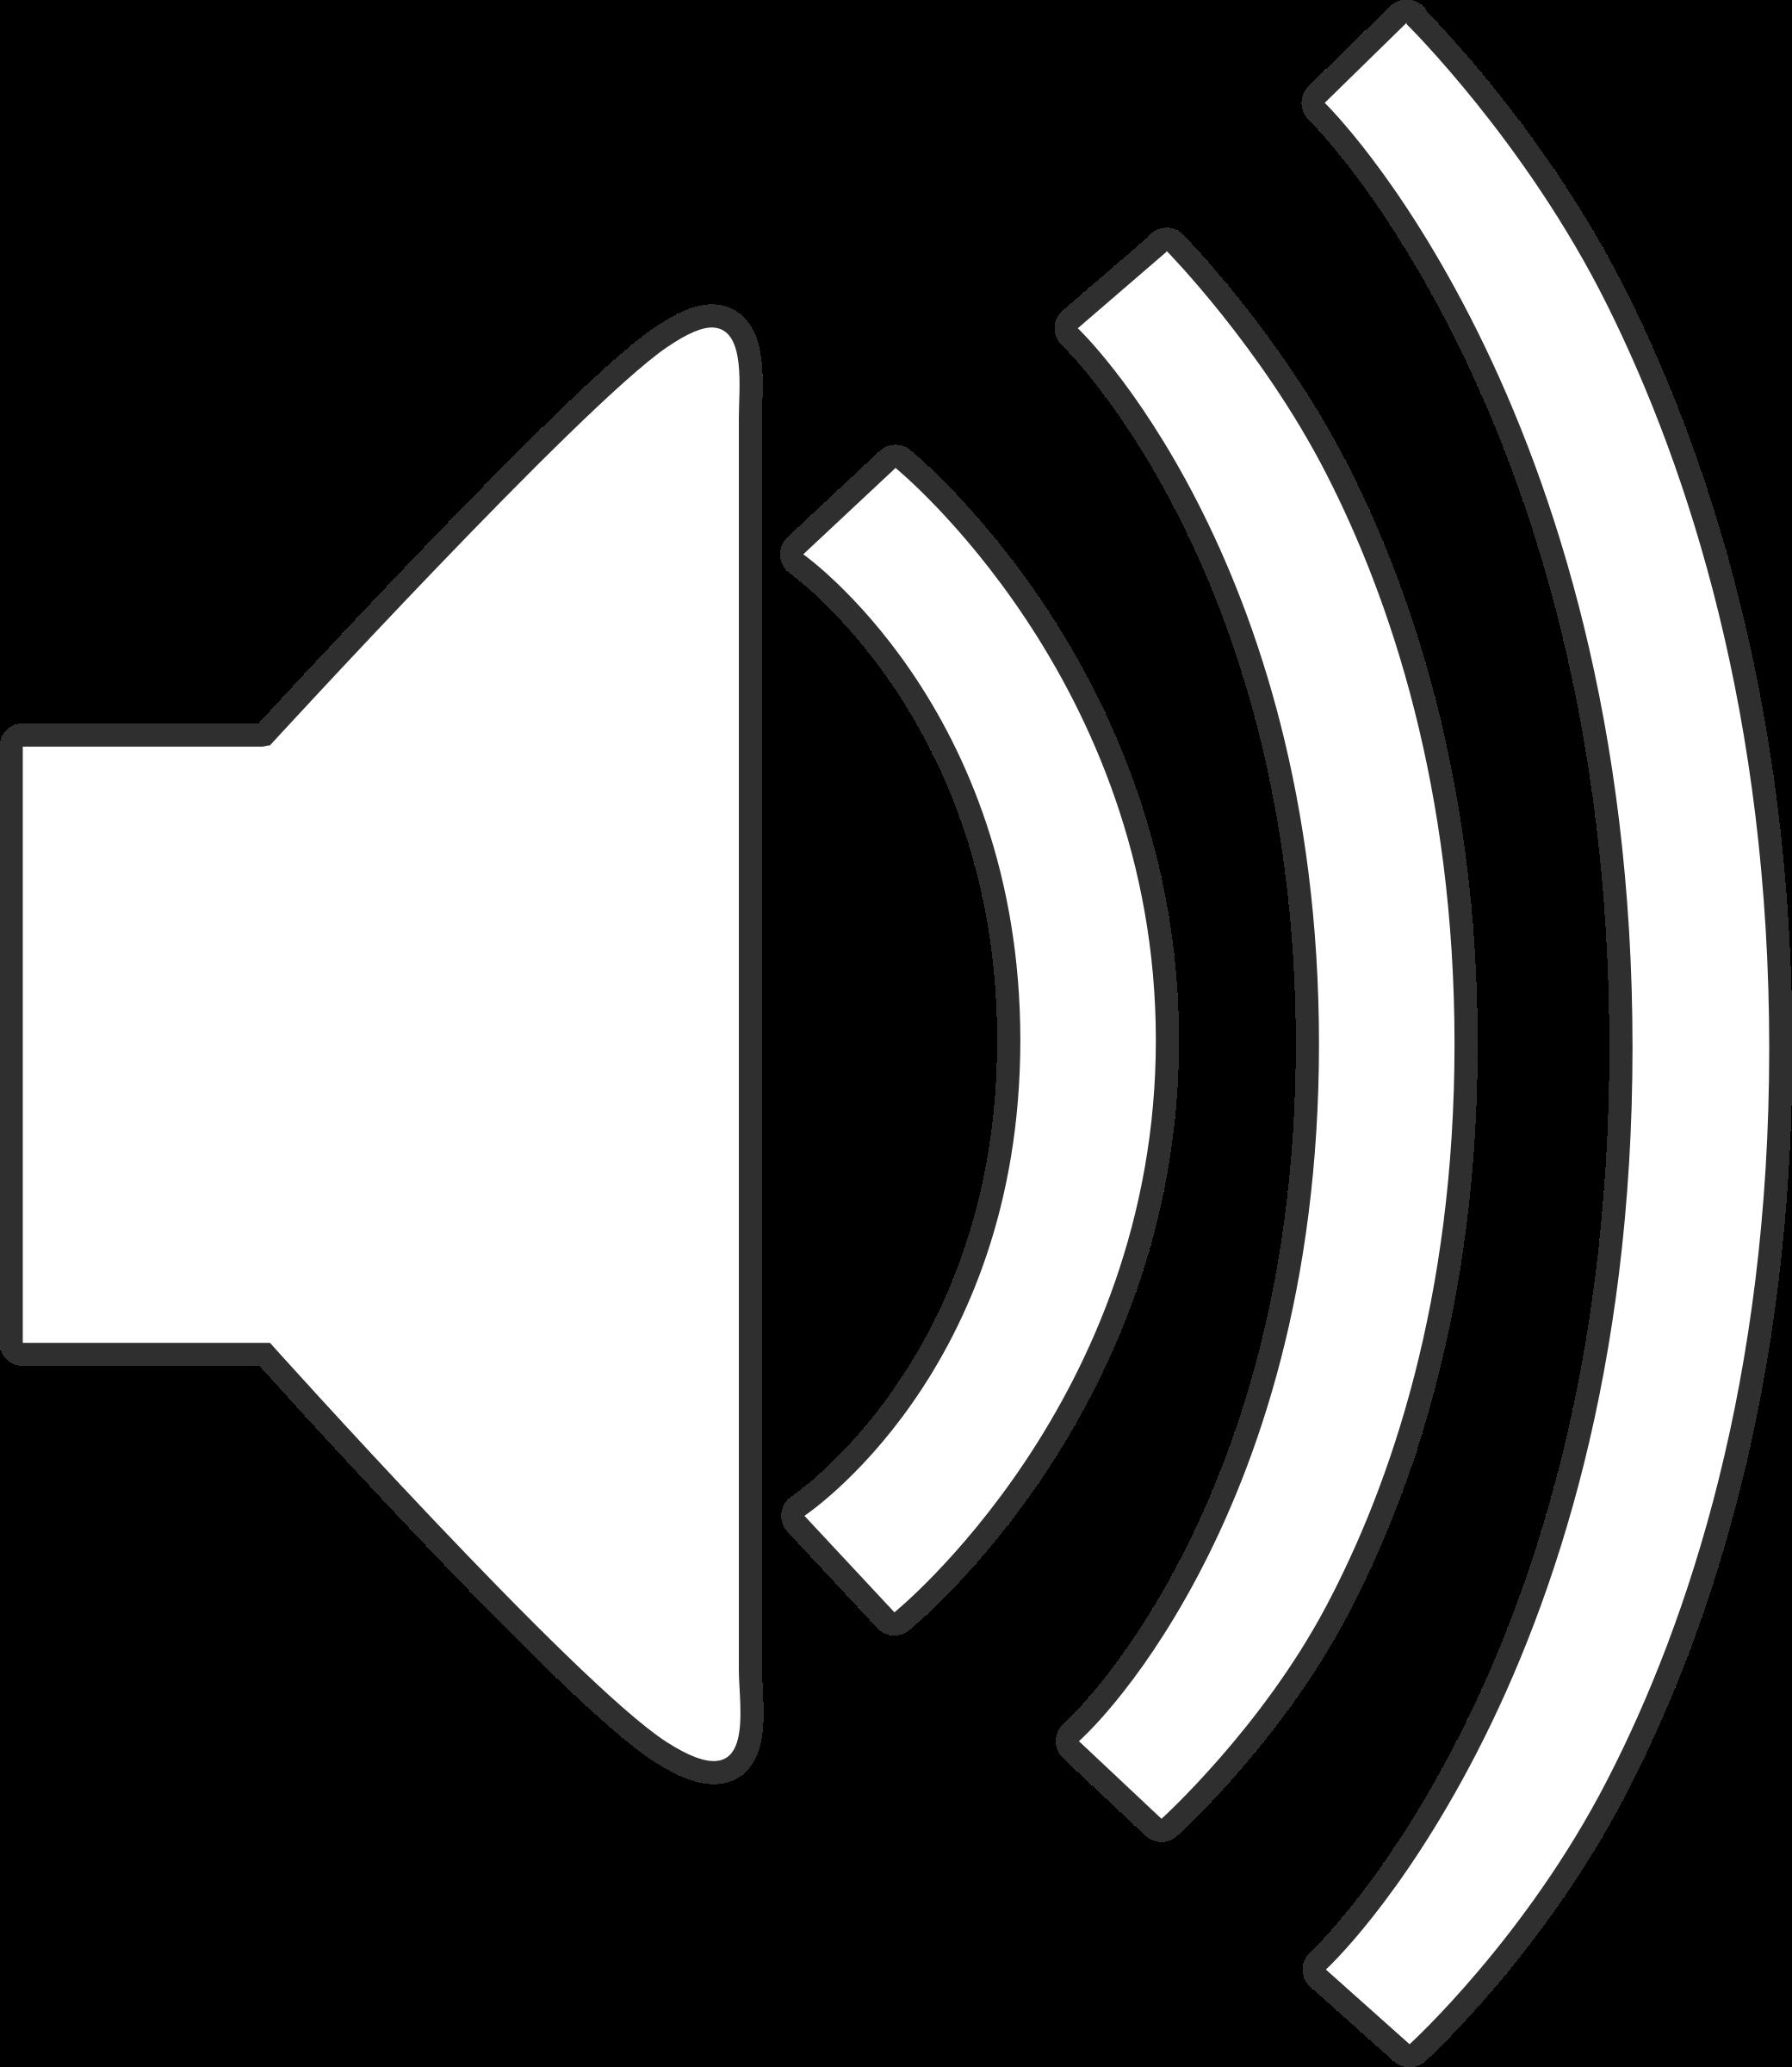 2081x2400 Speaker Clipart Audio Symbol Cute Borders, Vectors, Animated